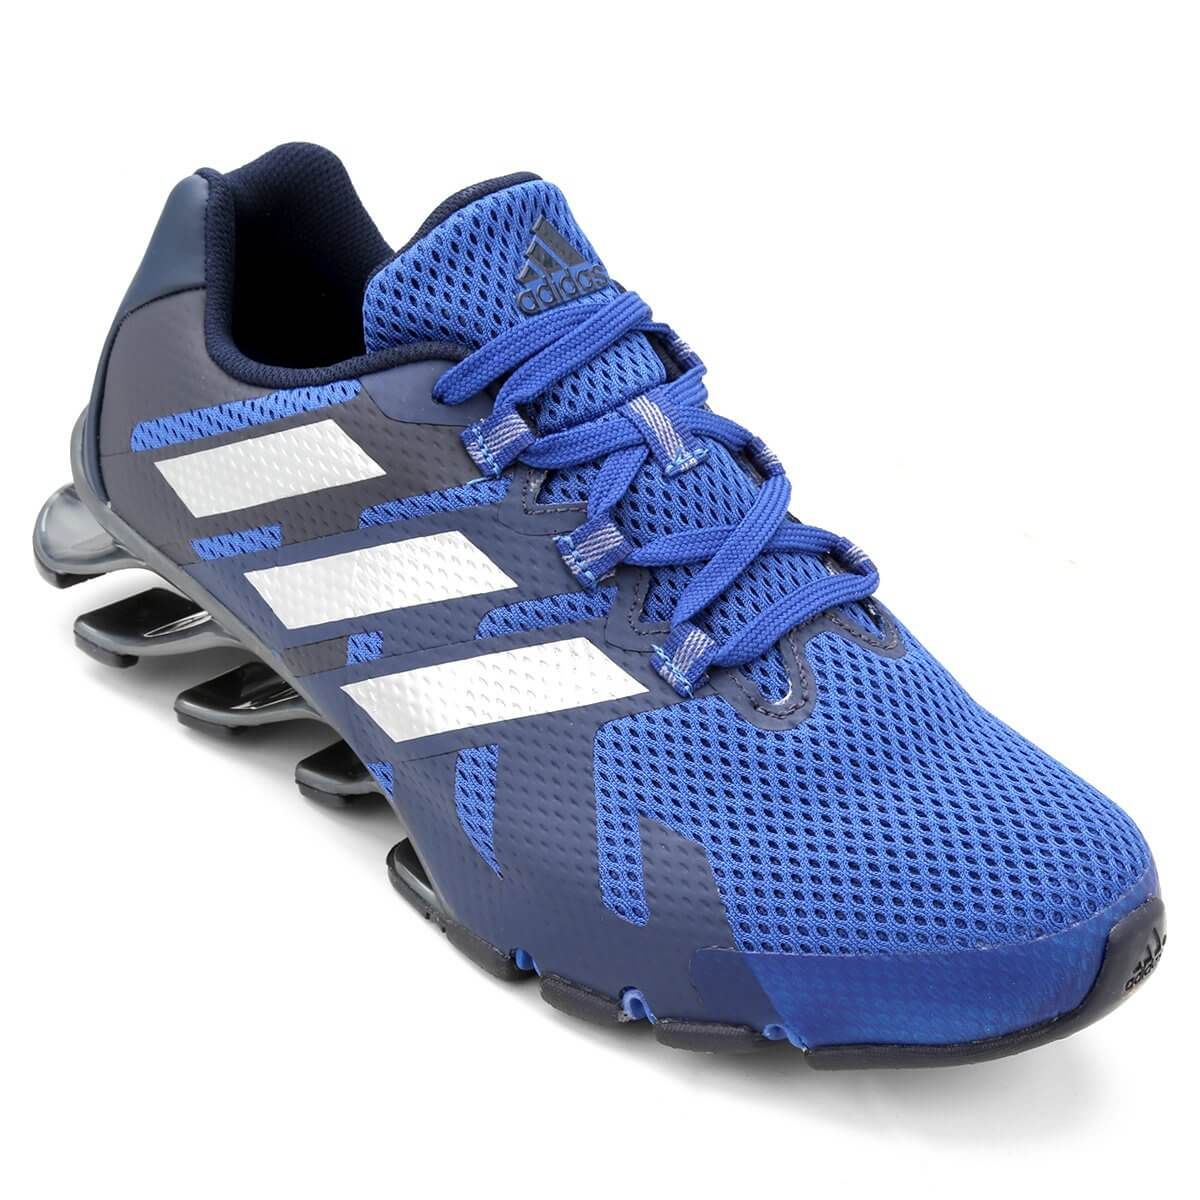 8436d029f6 Tênis Adidas SpringBlade E-Force Masculino - Decker Online!